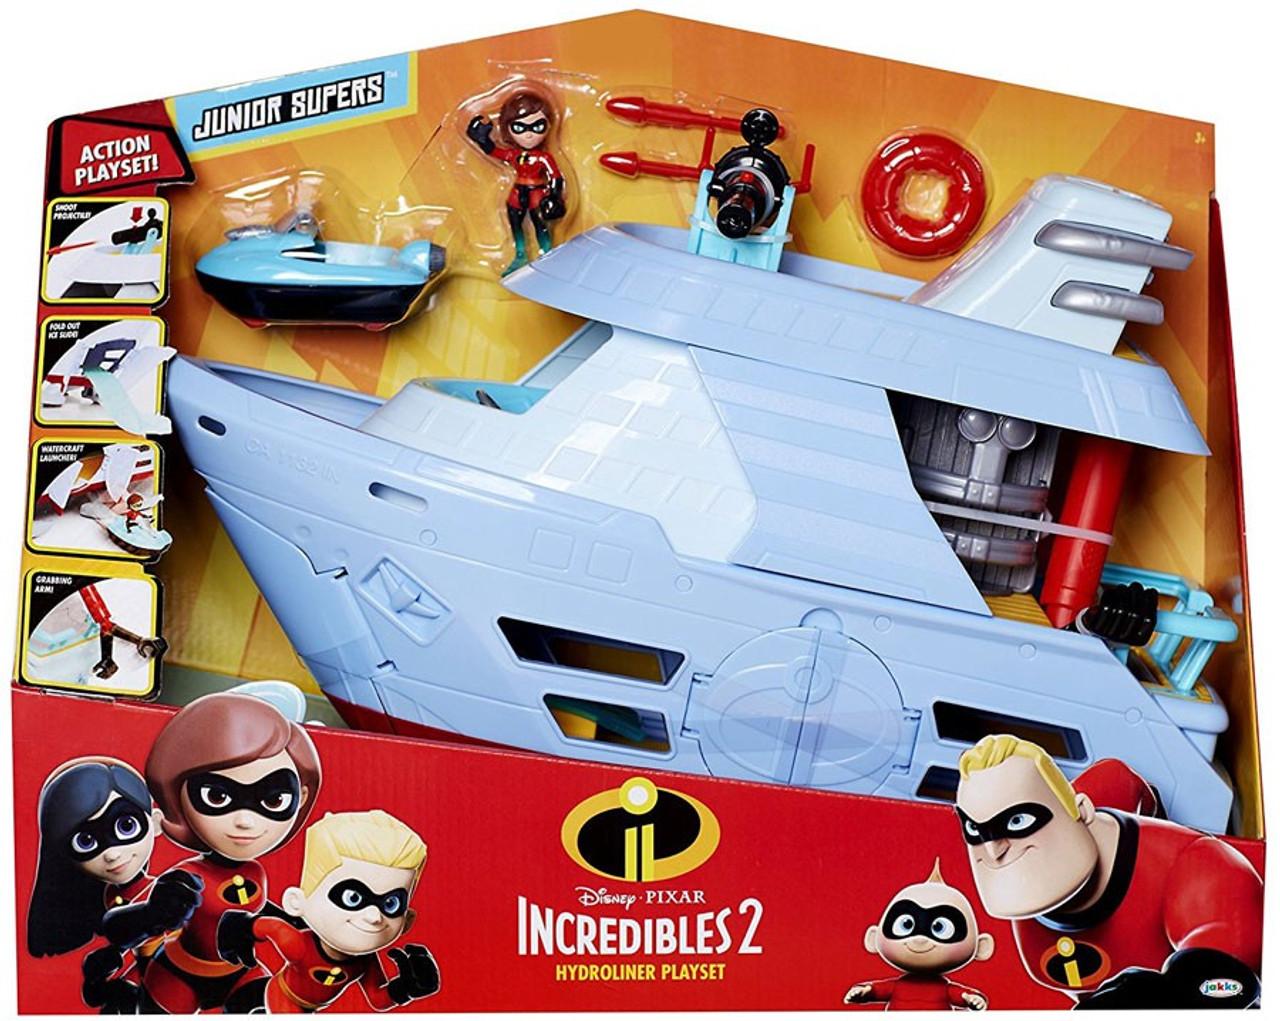 e54e0c41581 Disney Pixar Incredibles 2 Junior Supers Hydroliner Playset Jakks ...